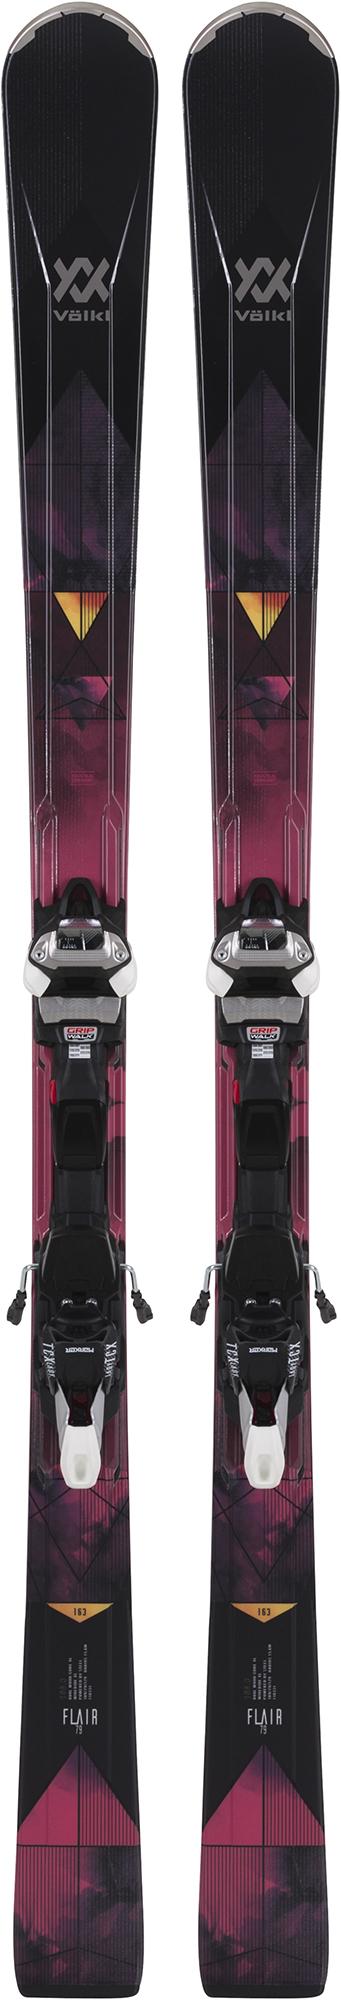 Volkl Flair 79 + iPT WR XL 11 TCX GW Lady (18/19) цена 2017